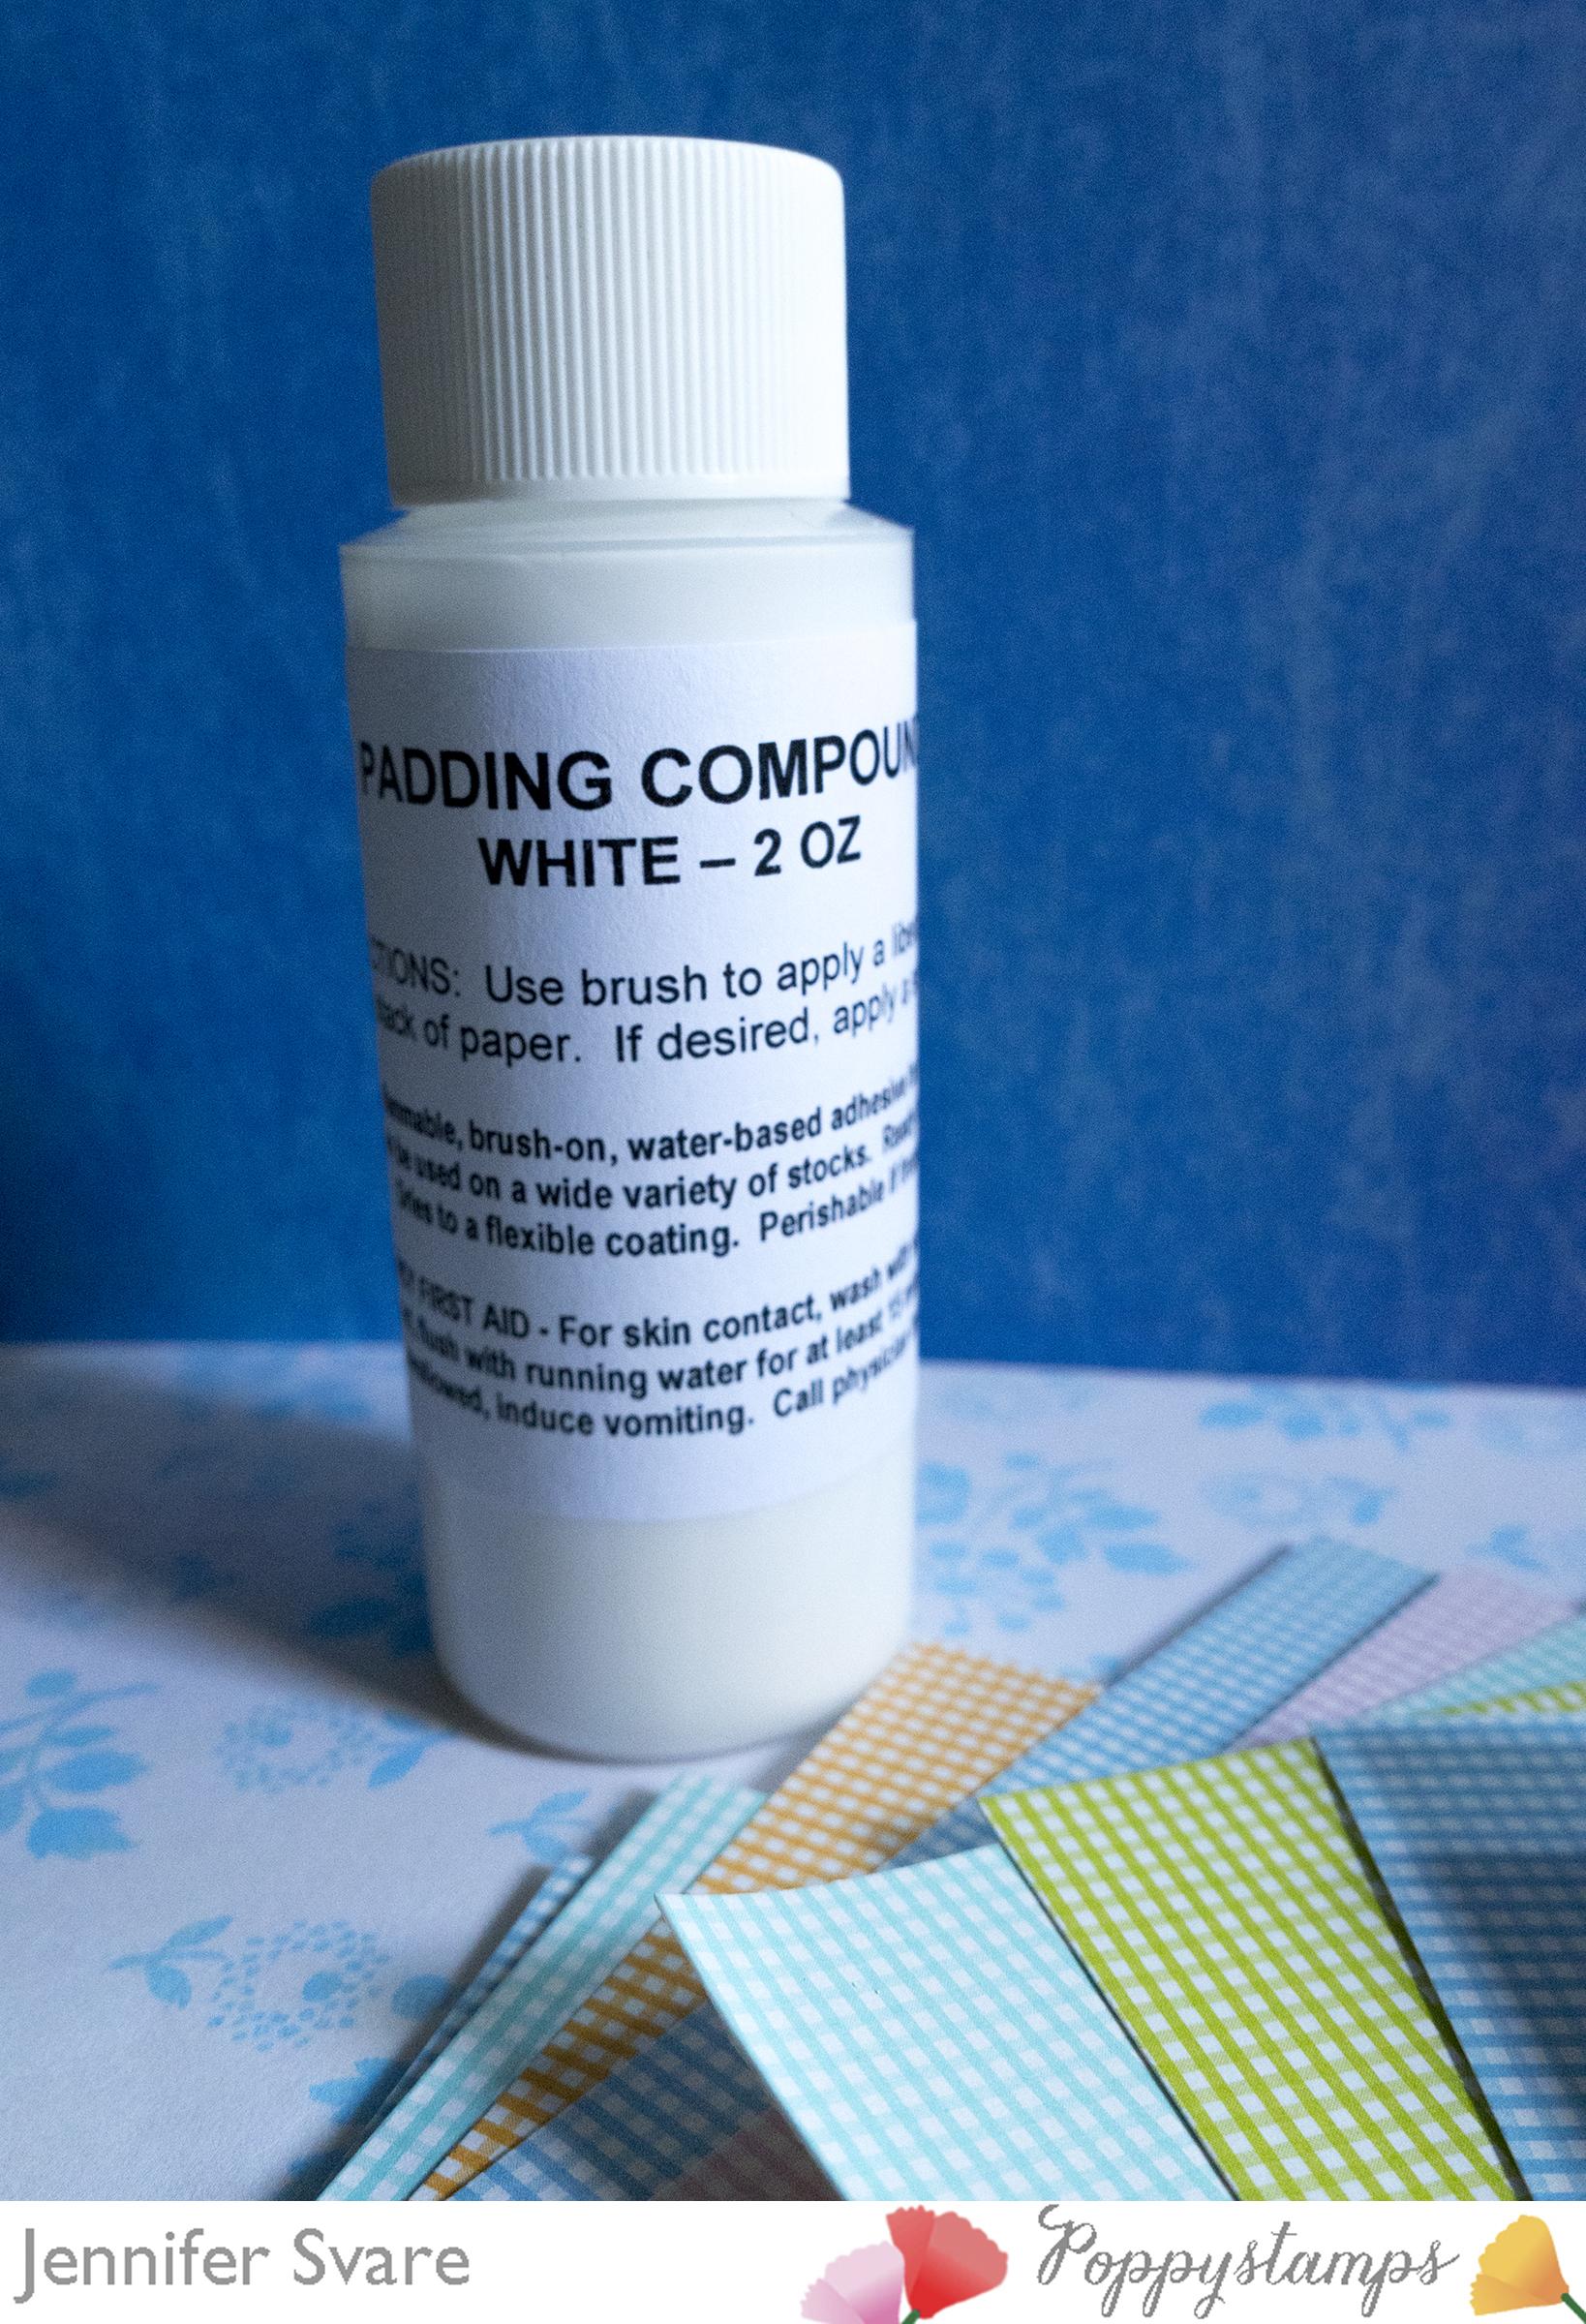 Padding Compound